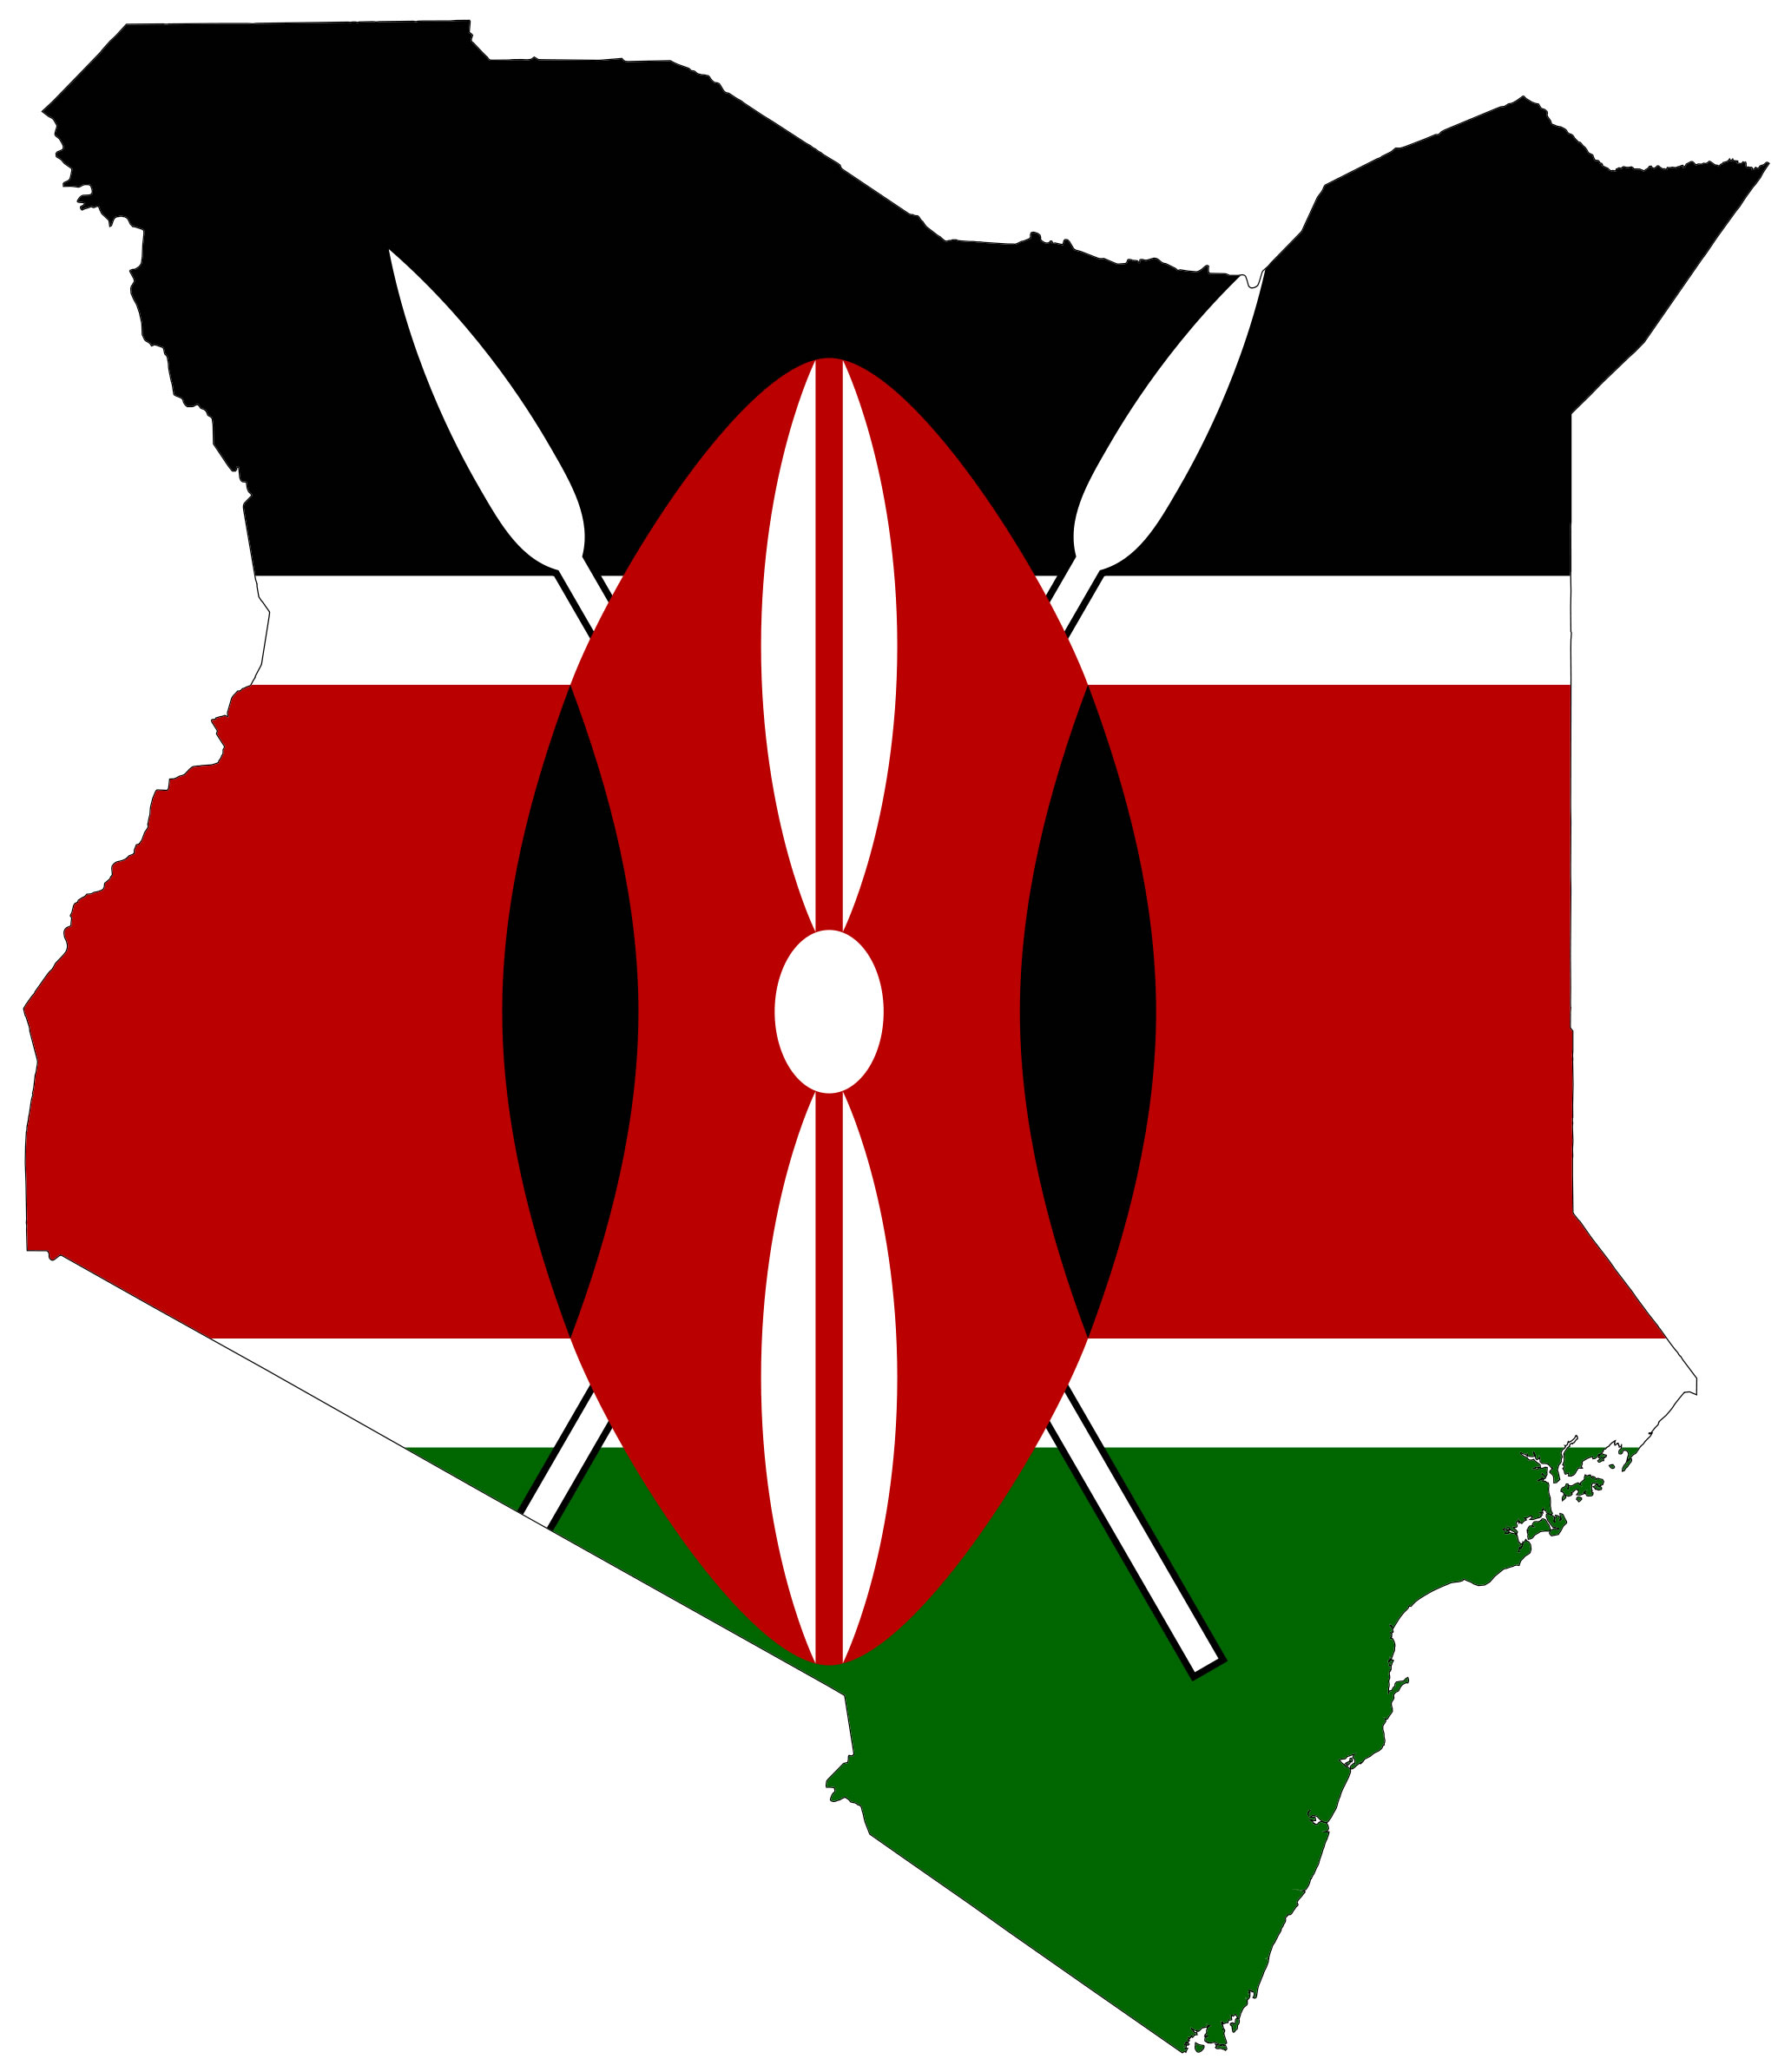 Carte drapeaux kenya carte drapeaux de kenya - Couleur du monde kenya ...